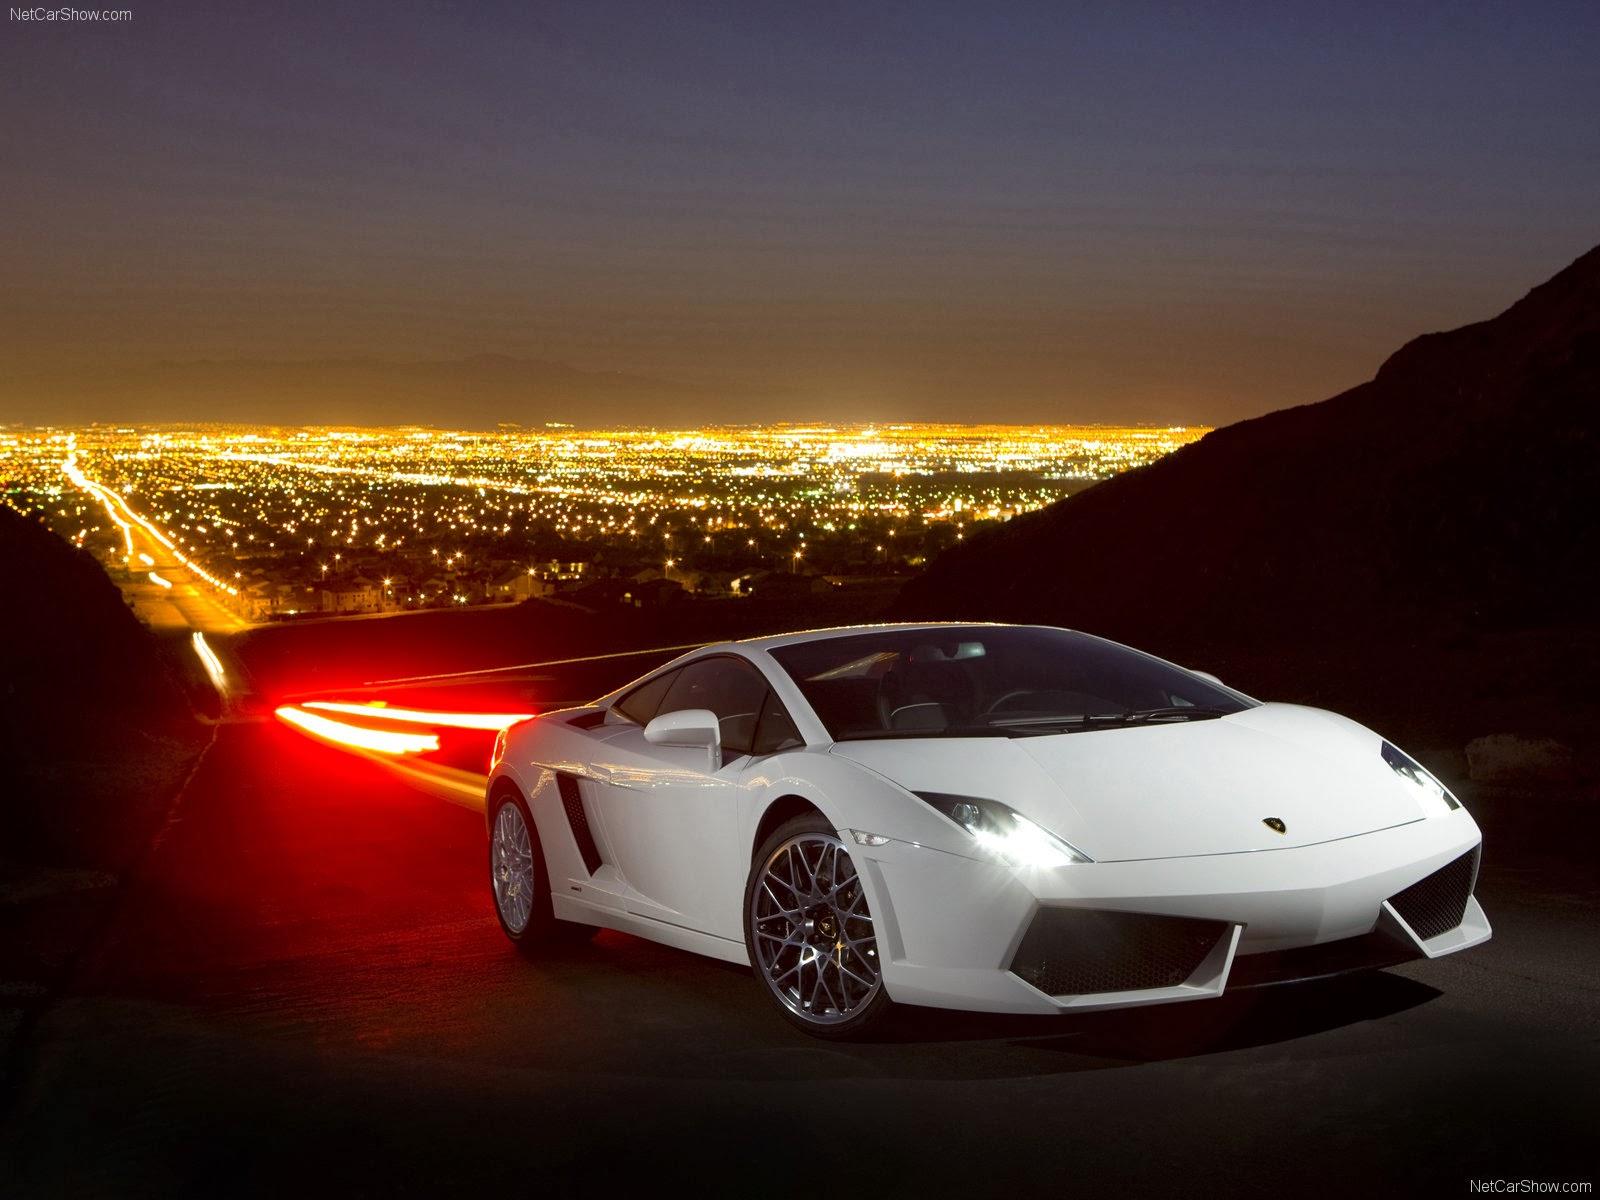 Most Inspiring Wallpaper High Quality Lamborghini - 7-Lamborghini  2018_434346.jpg